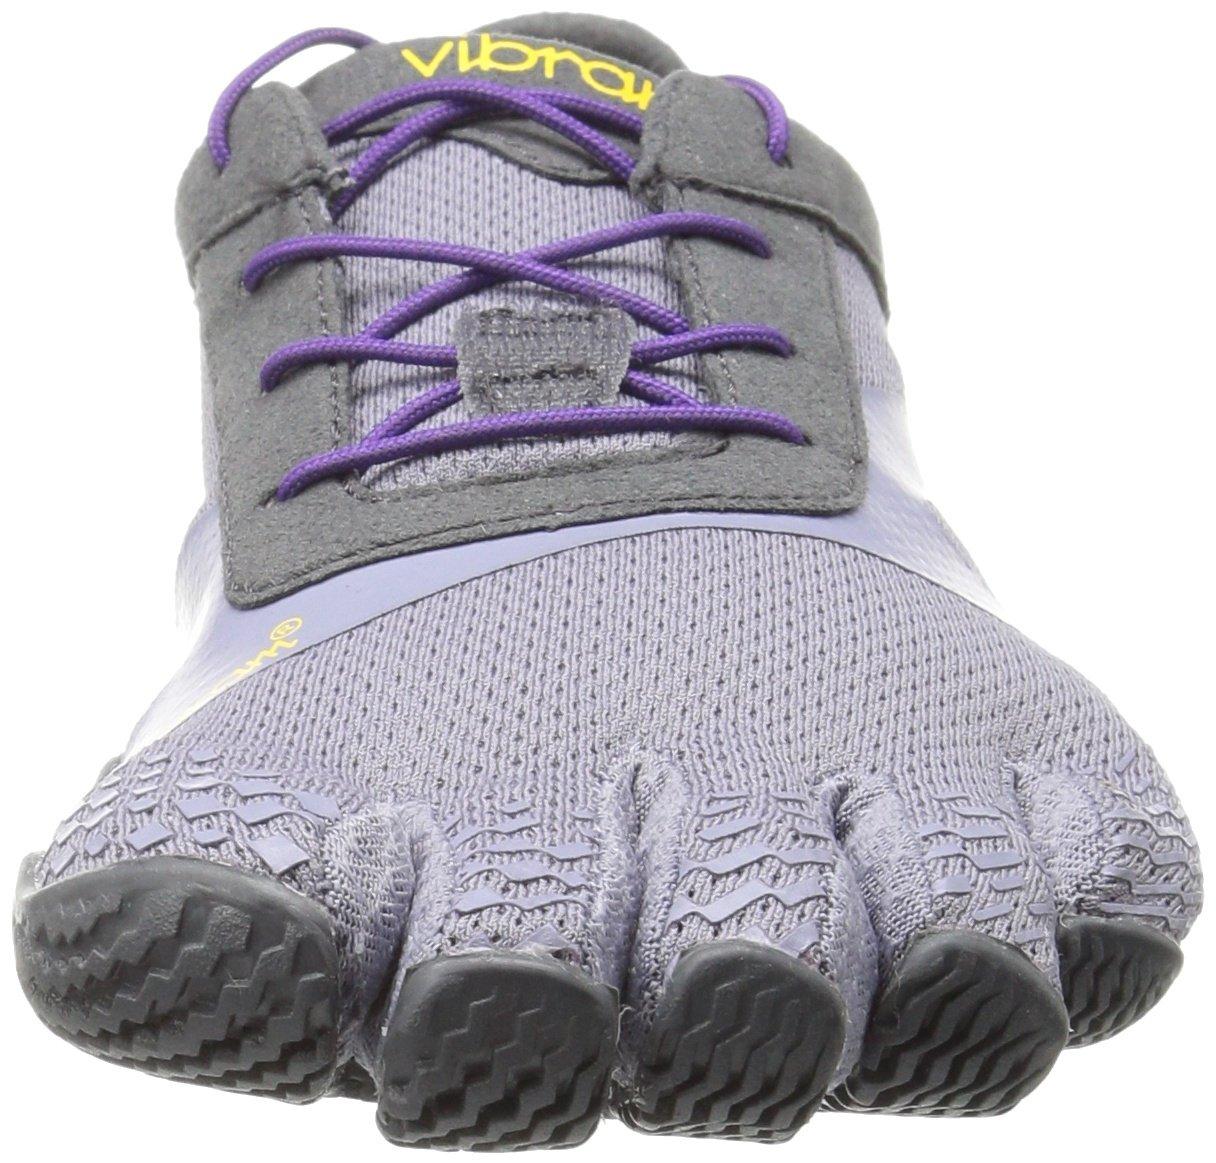 Vibram Women's KSO Evo Running Shoe B01H8OGMES 39 EU/7.5-8 M US|Lavender/Purple